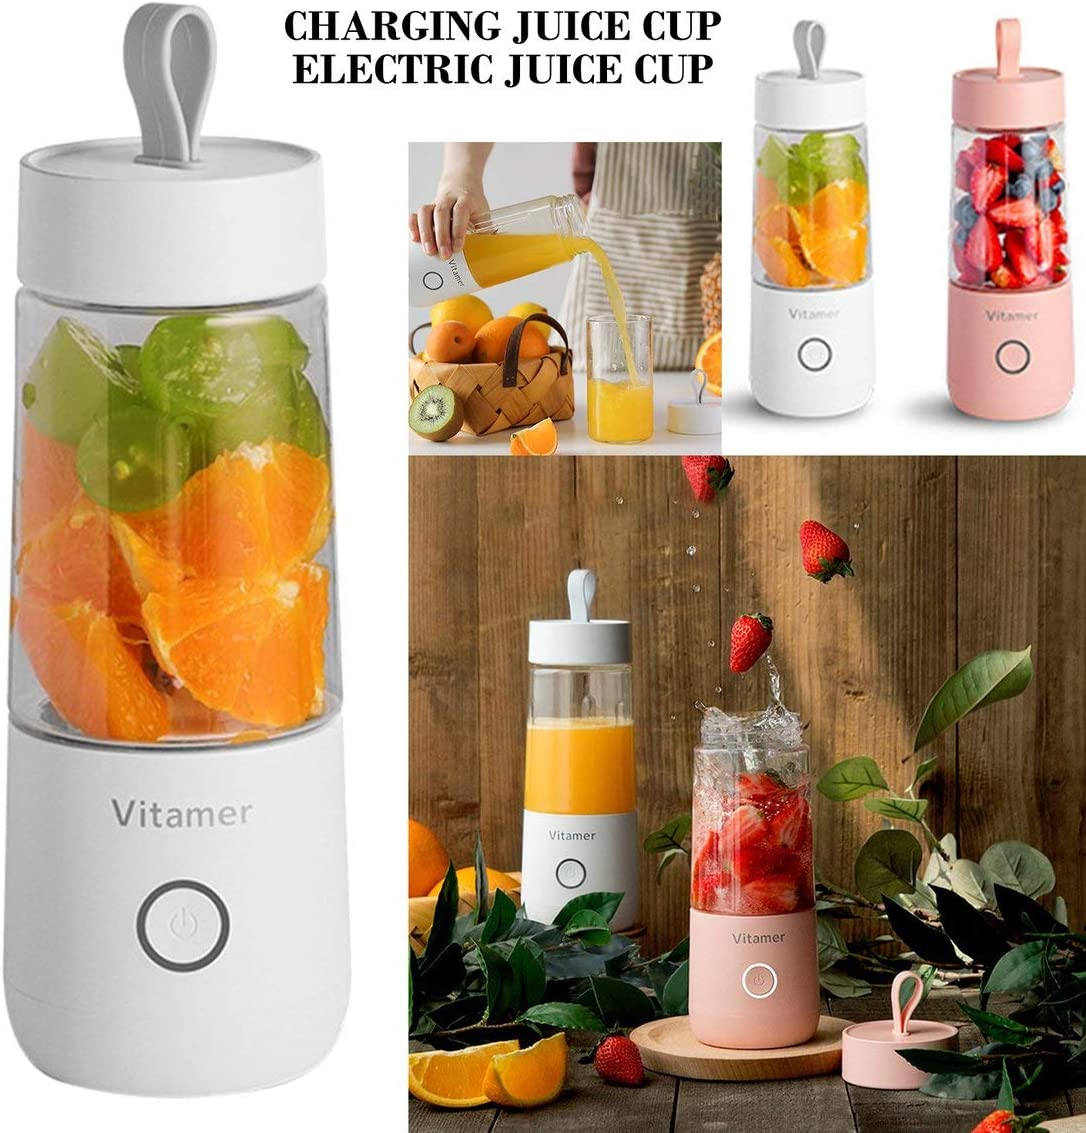 Gugutogo Vitamina Juice Cup Vitamer Juicer port/átil V Juging Cup Juice Cup Electric Juice Cup Moda profesional